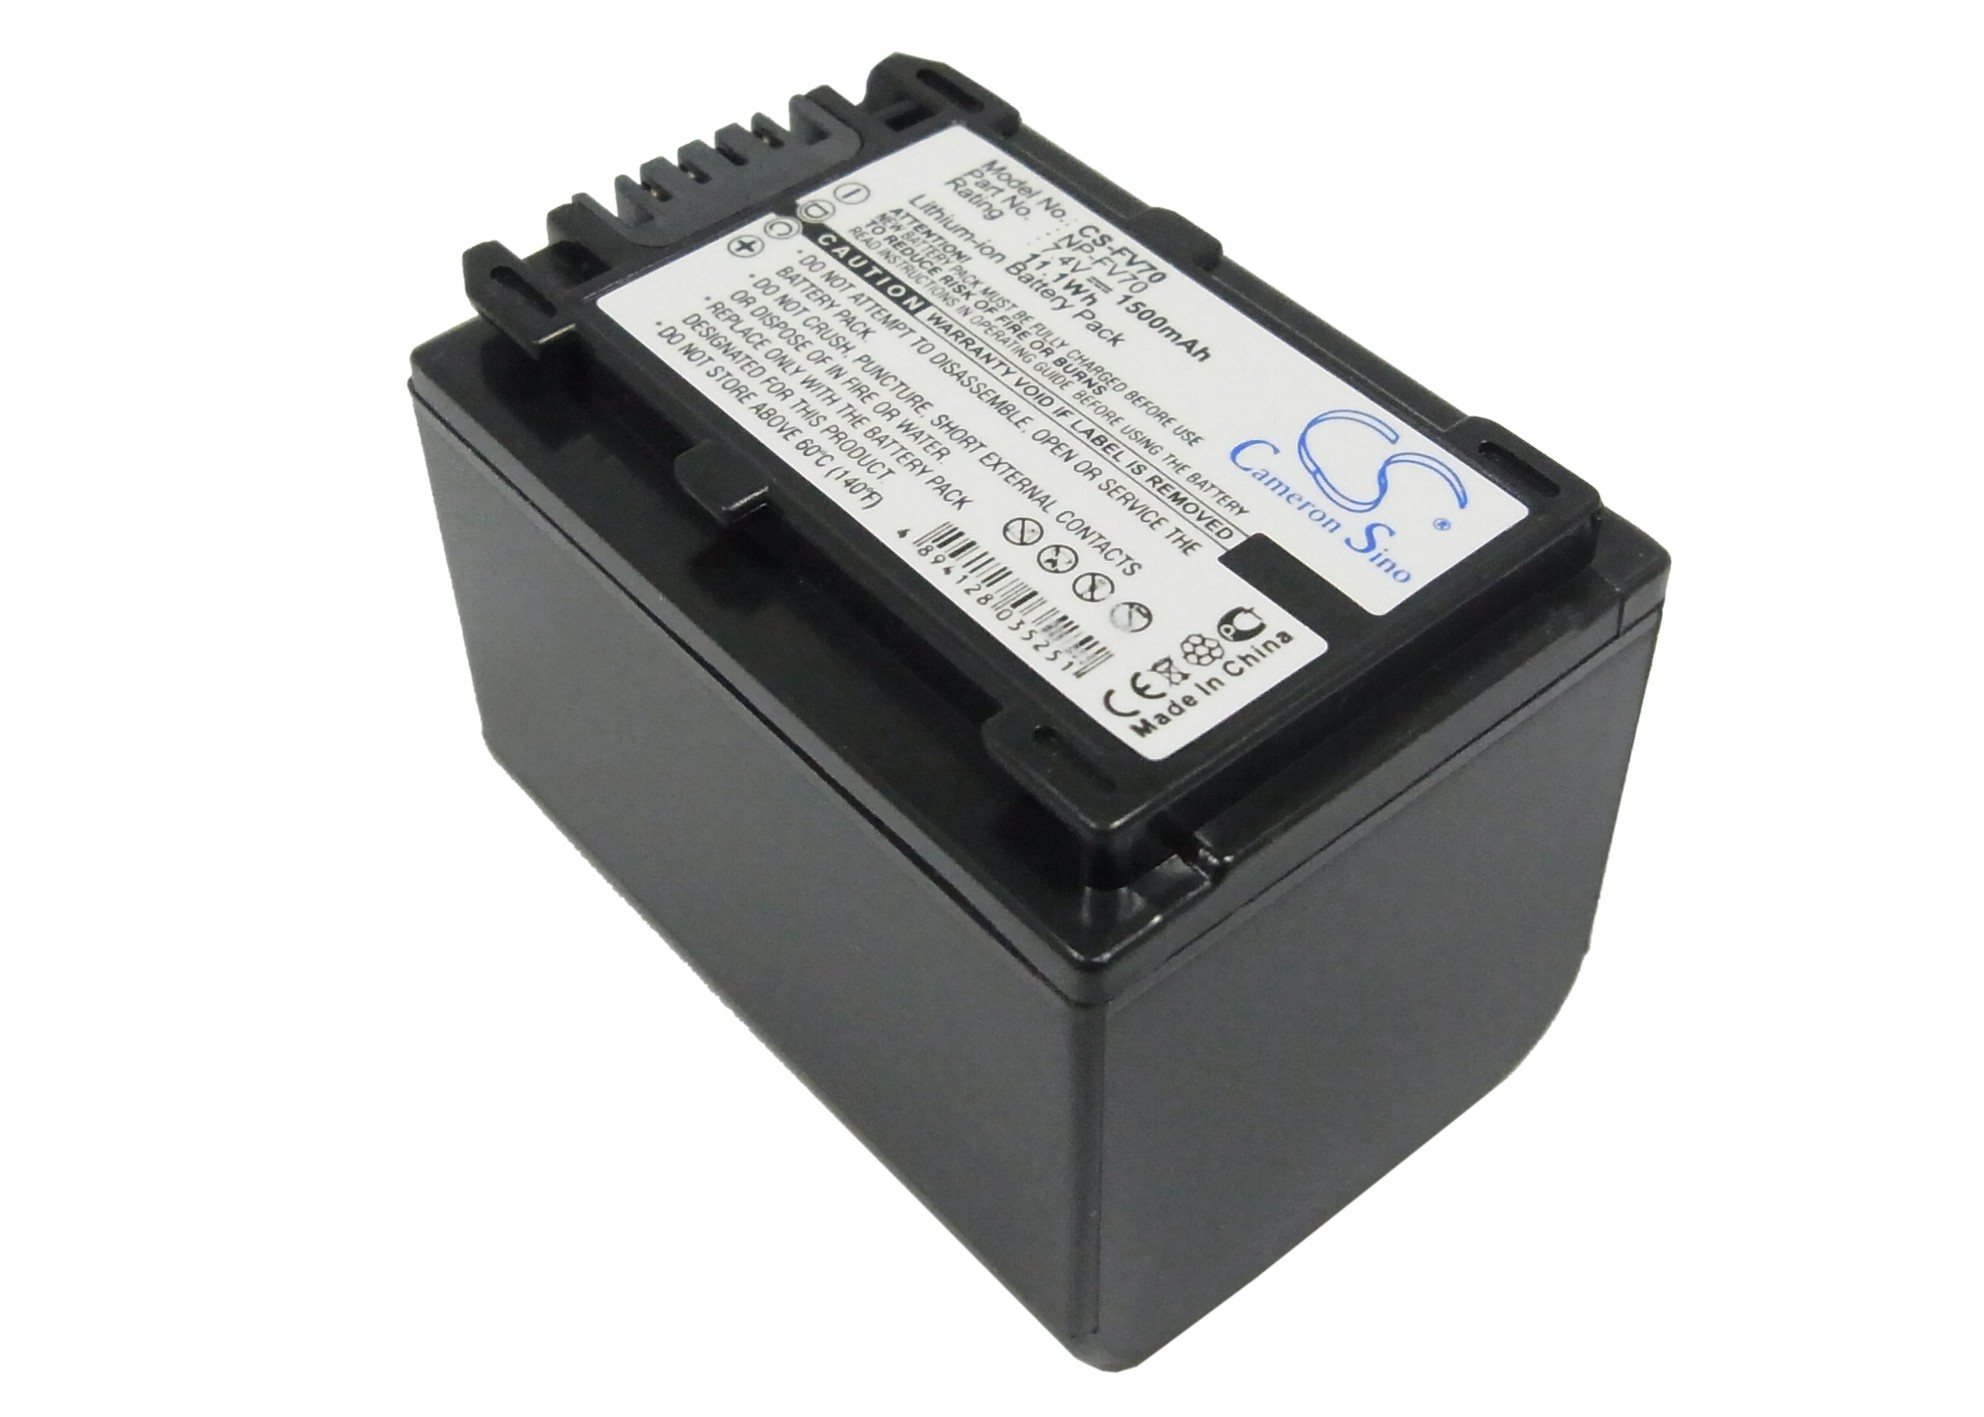 Cameron Sino baterie do kamer a fotoaparátů pro SONY DCR-DVD450E 7.4V Li-ion 1500mAh černá - neoriginální